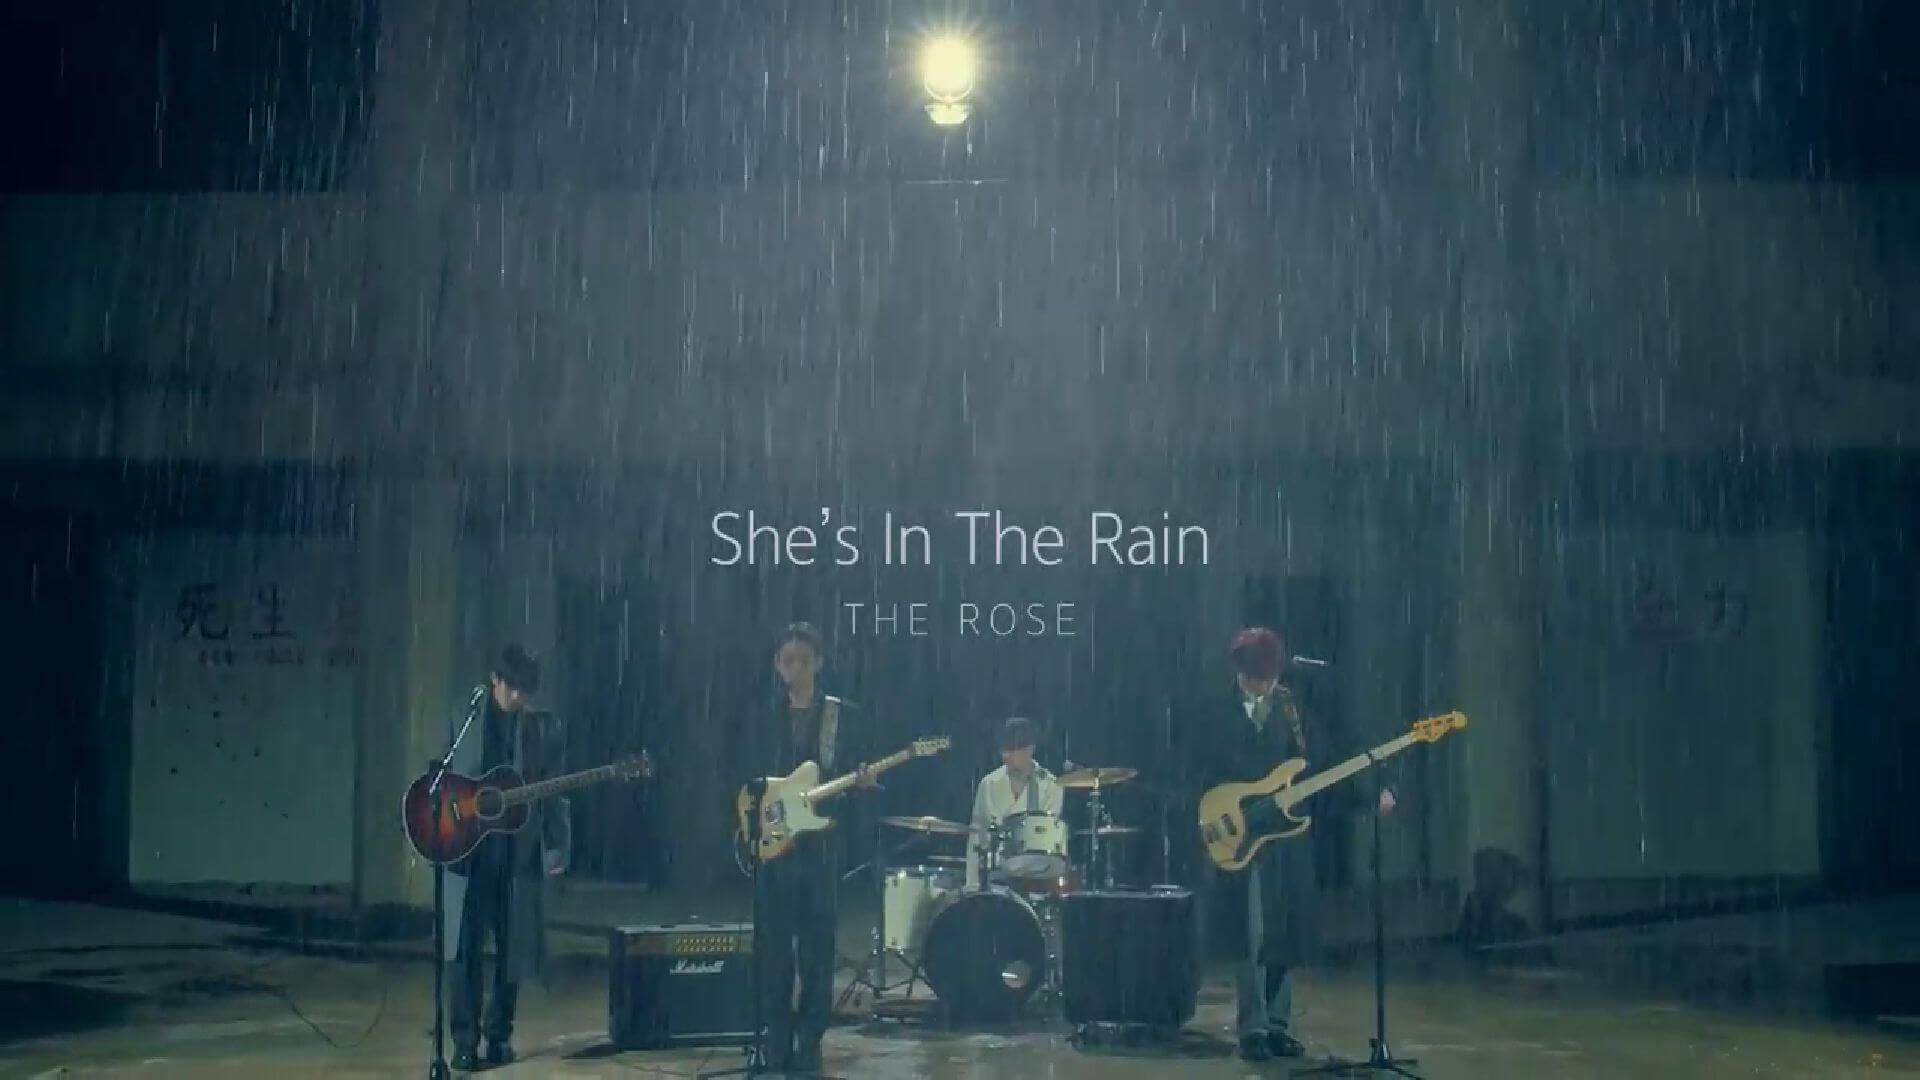 The Rose She's In The Rain clip